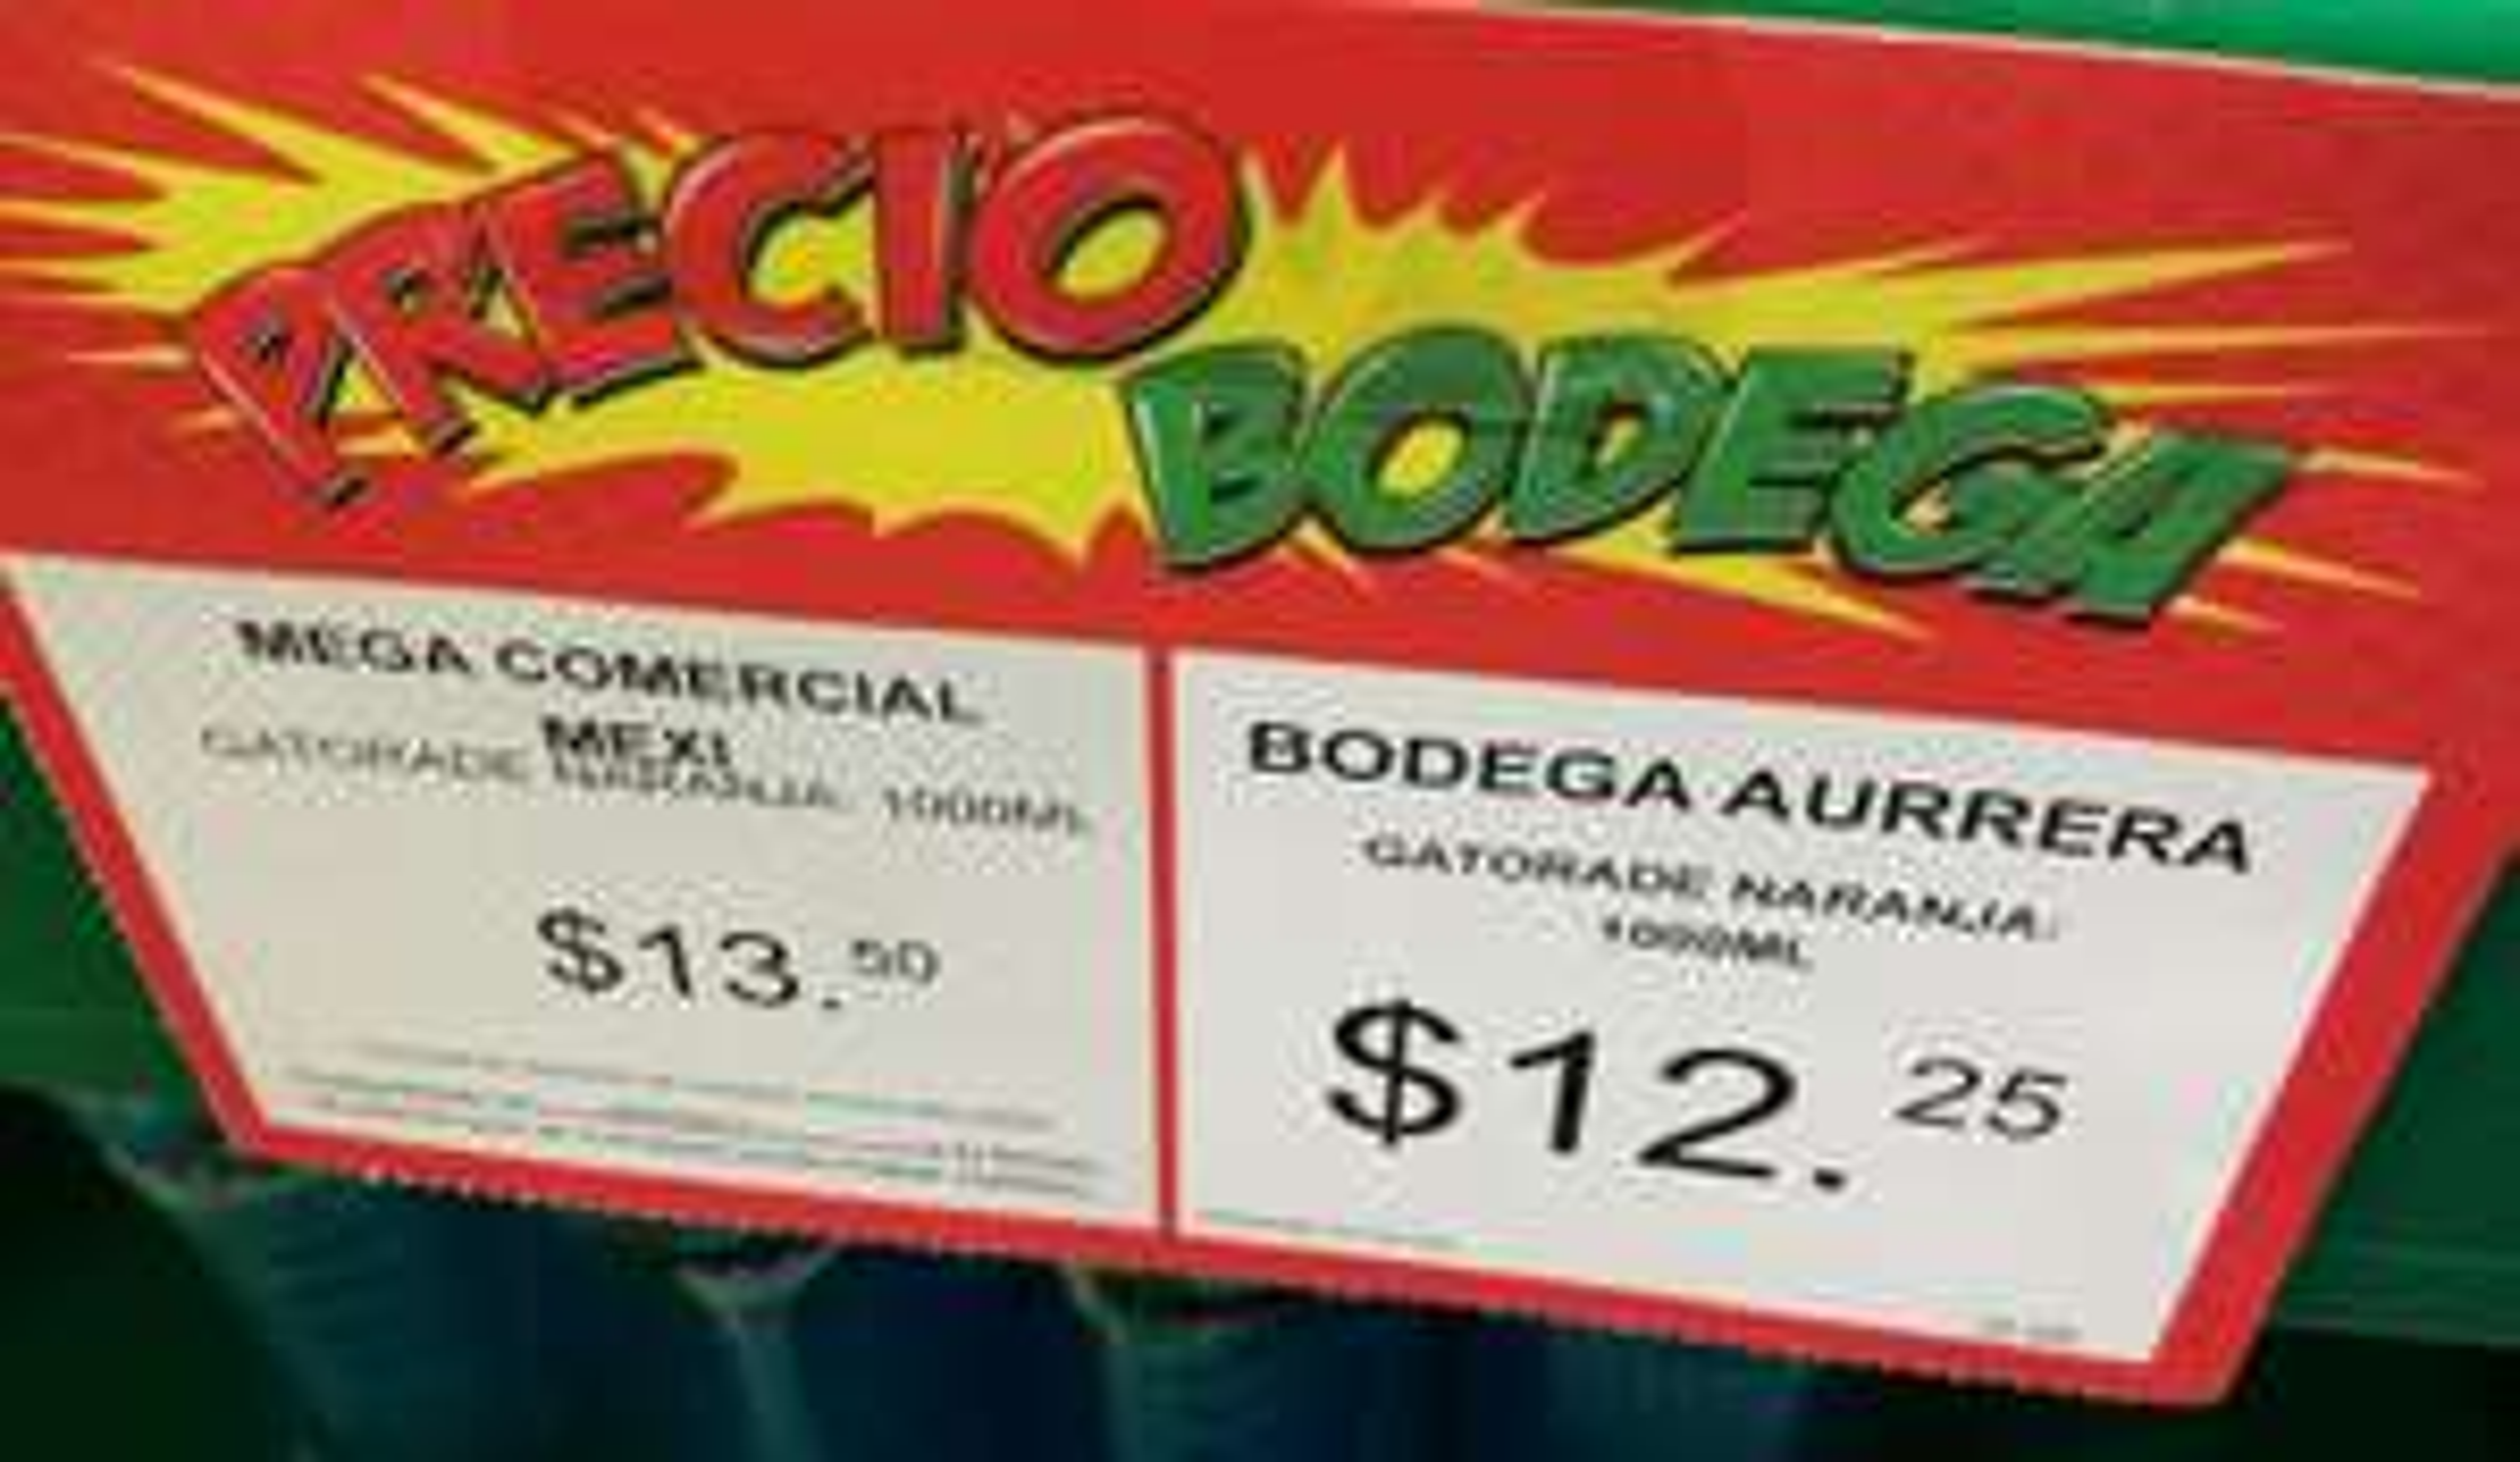 Bodega Aurrera: Gatorade de 1lt a $12.25